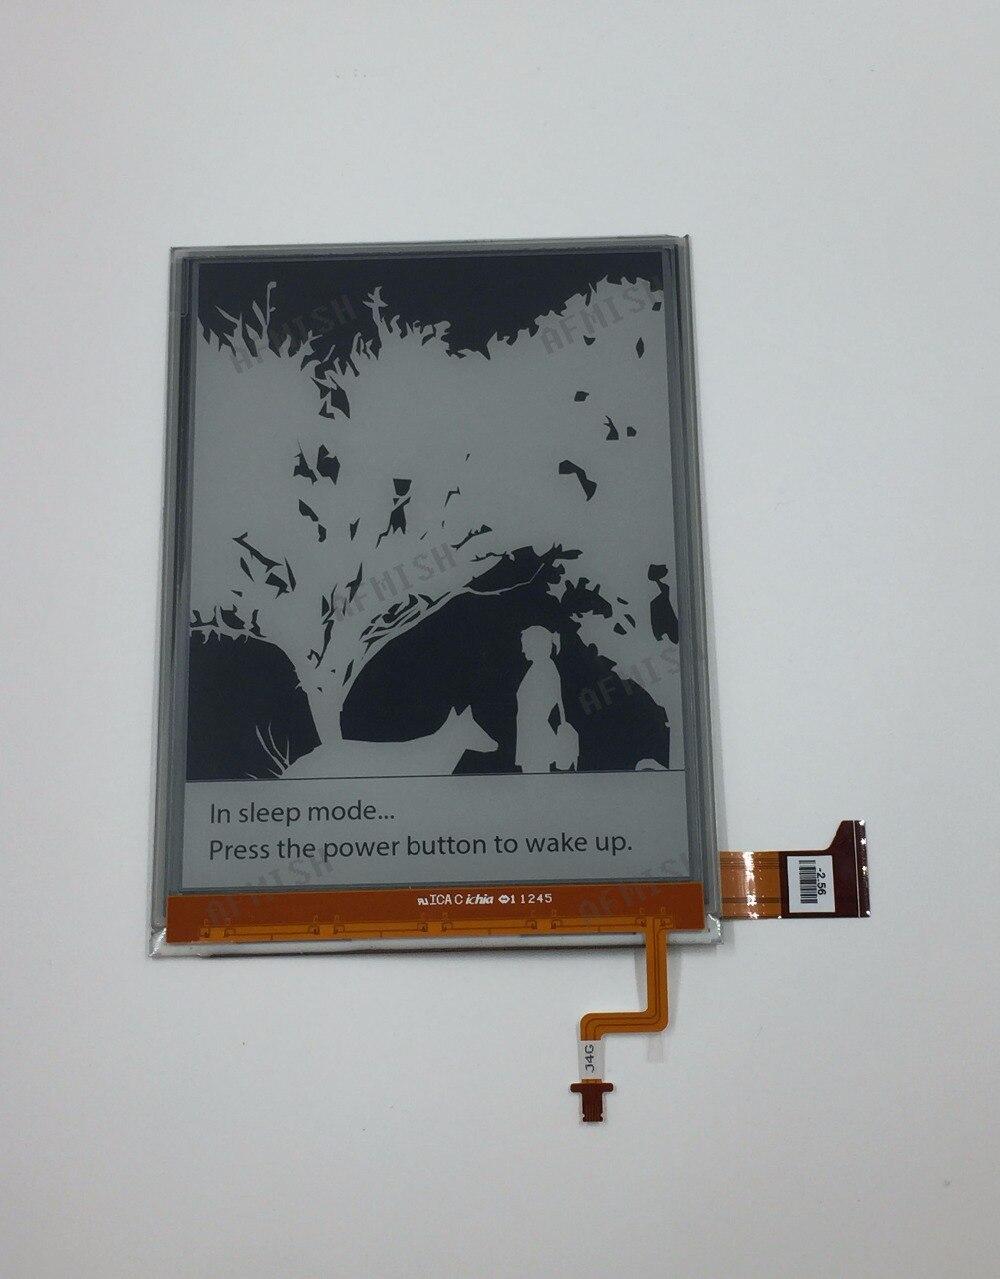 100%-pantalla LCD para lector de libros electrónicos, no utilizado para modelo pocketbook, 1024x758, con retroiluminación, sin contacto, envío gratis, novedad